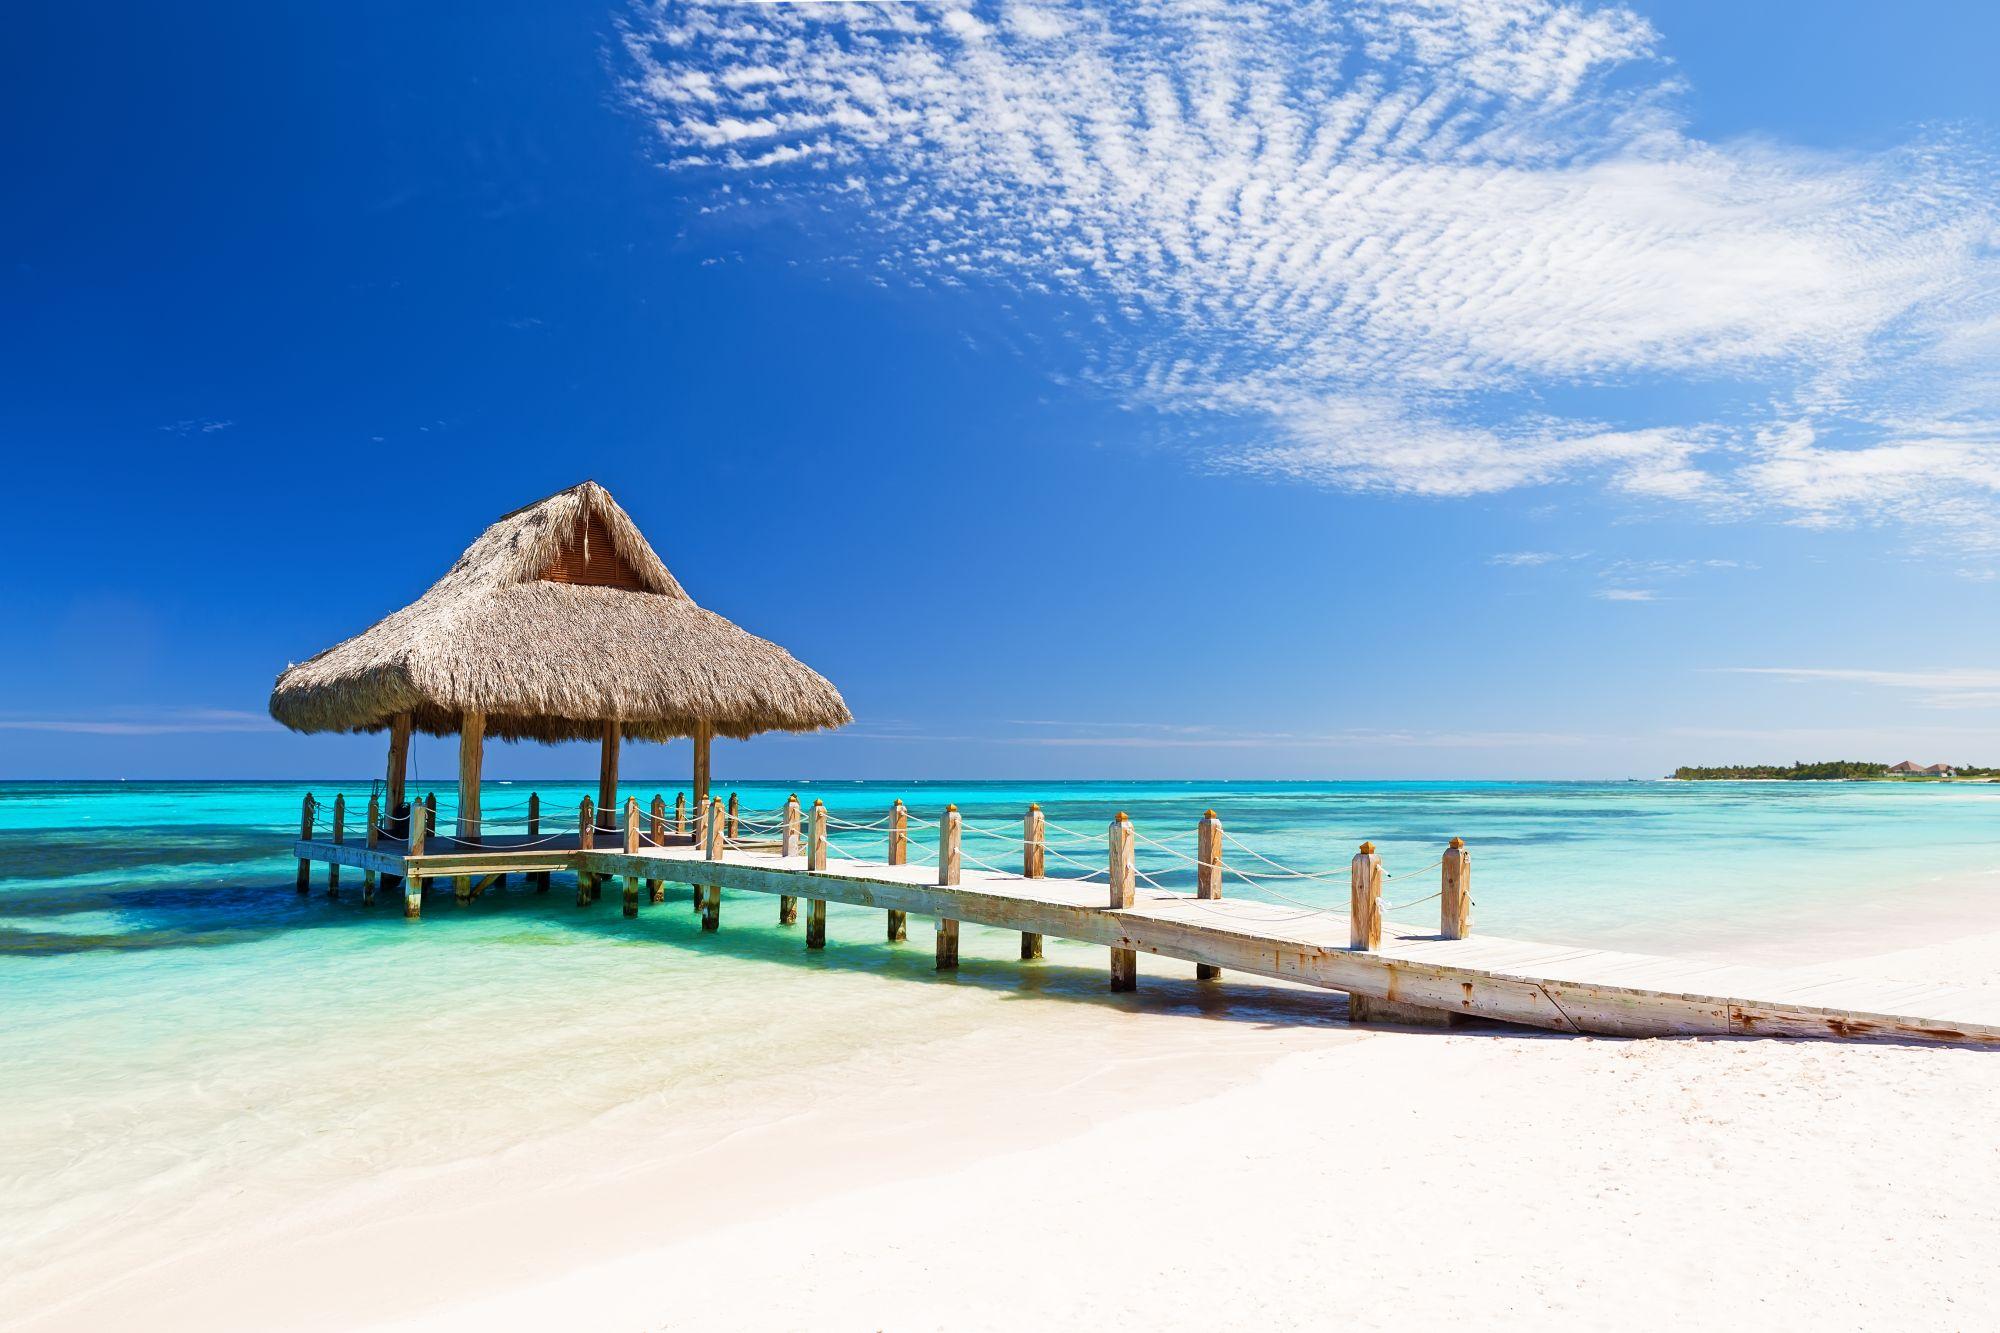 Dominikana widok plaży